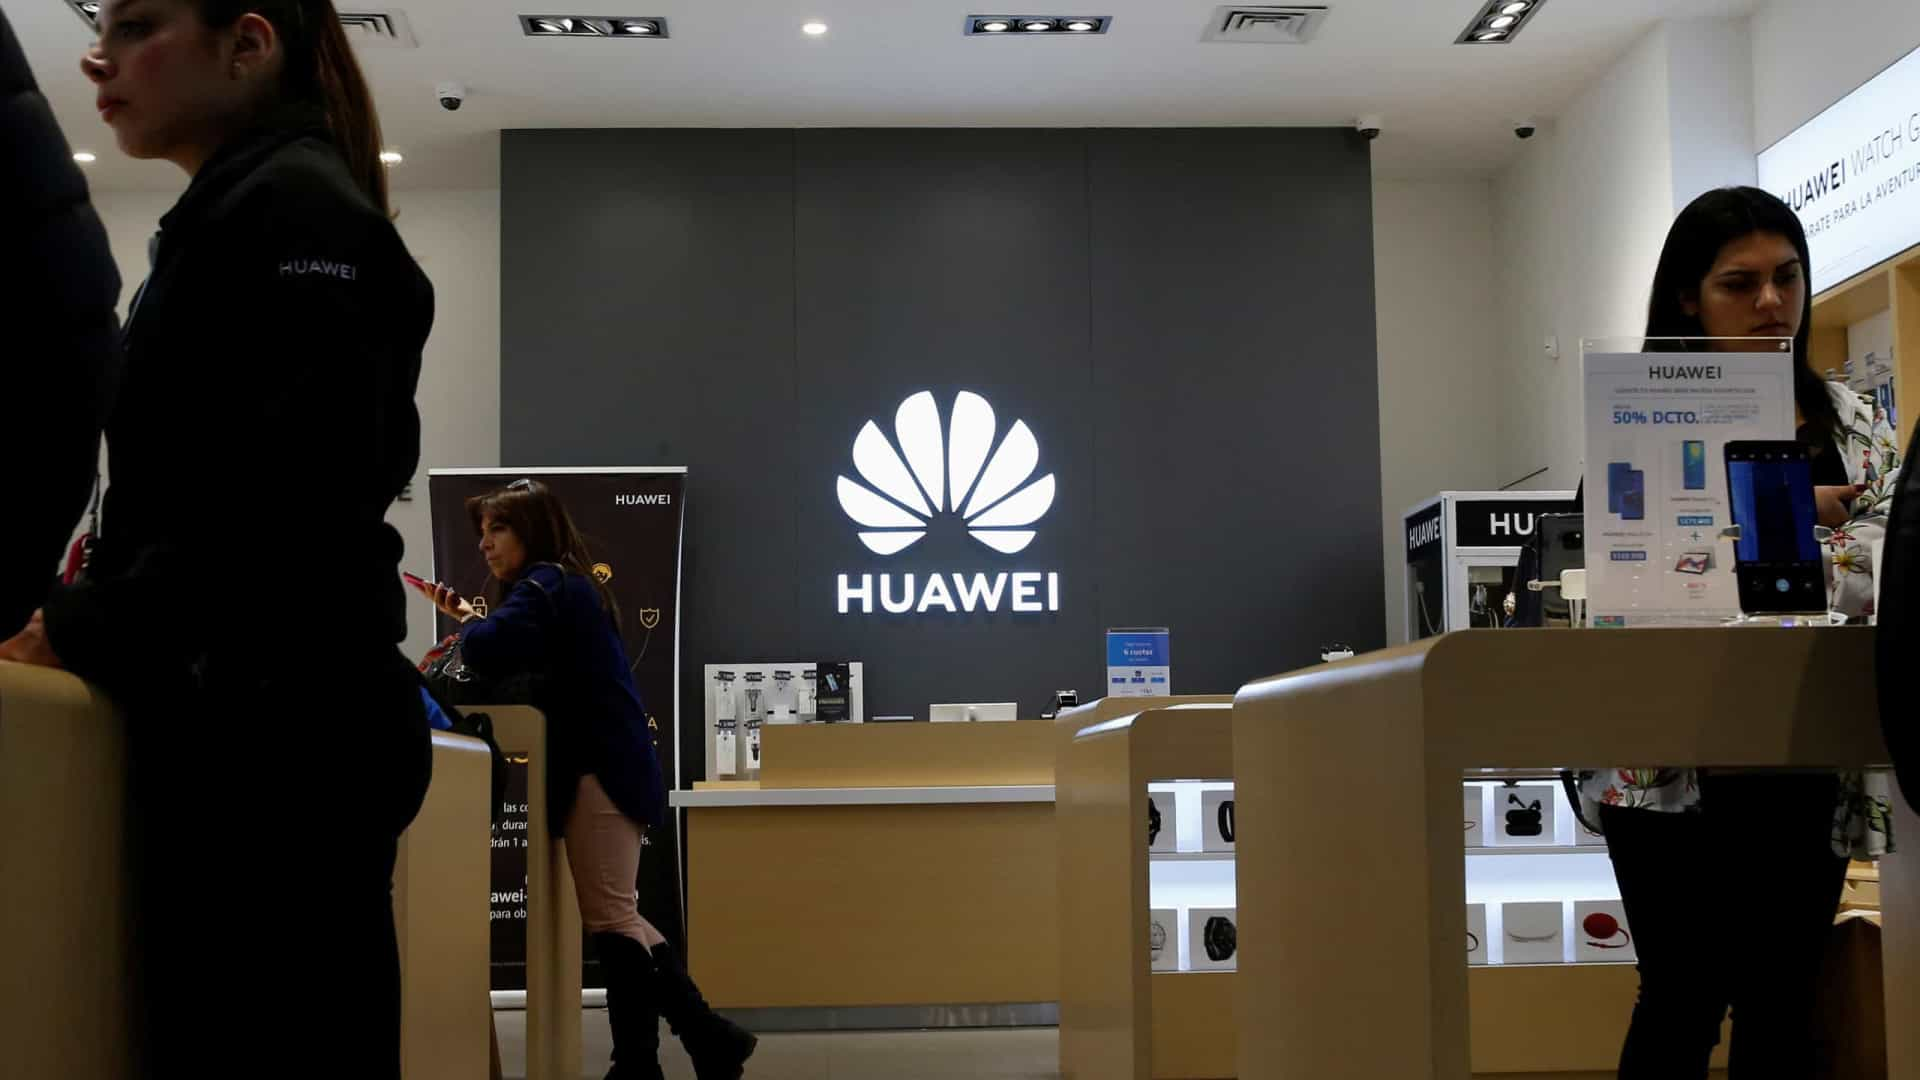 Huawei. Desvendadas capacidades das baterias dos novos topos de gama